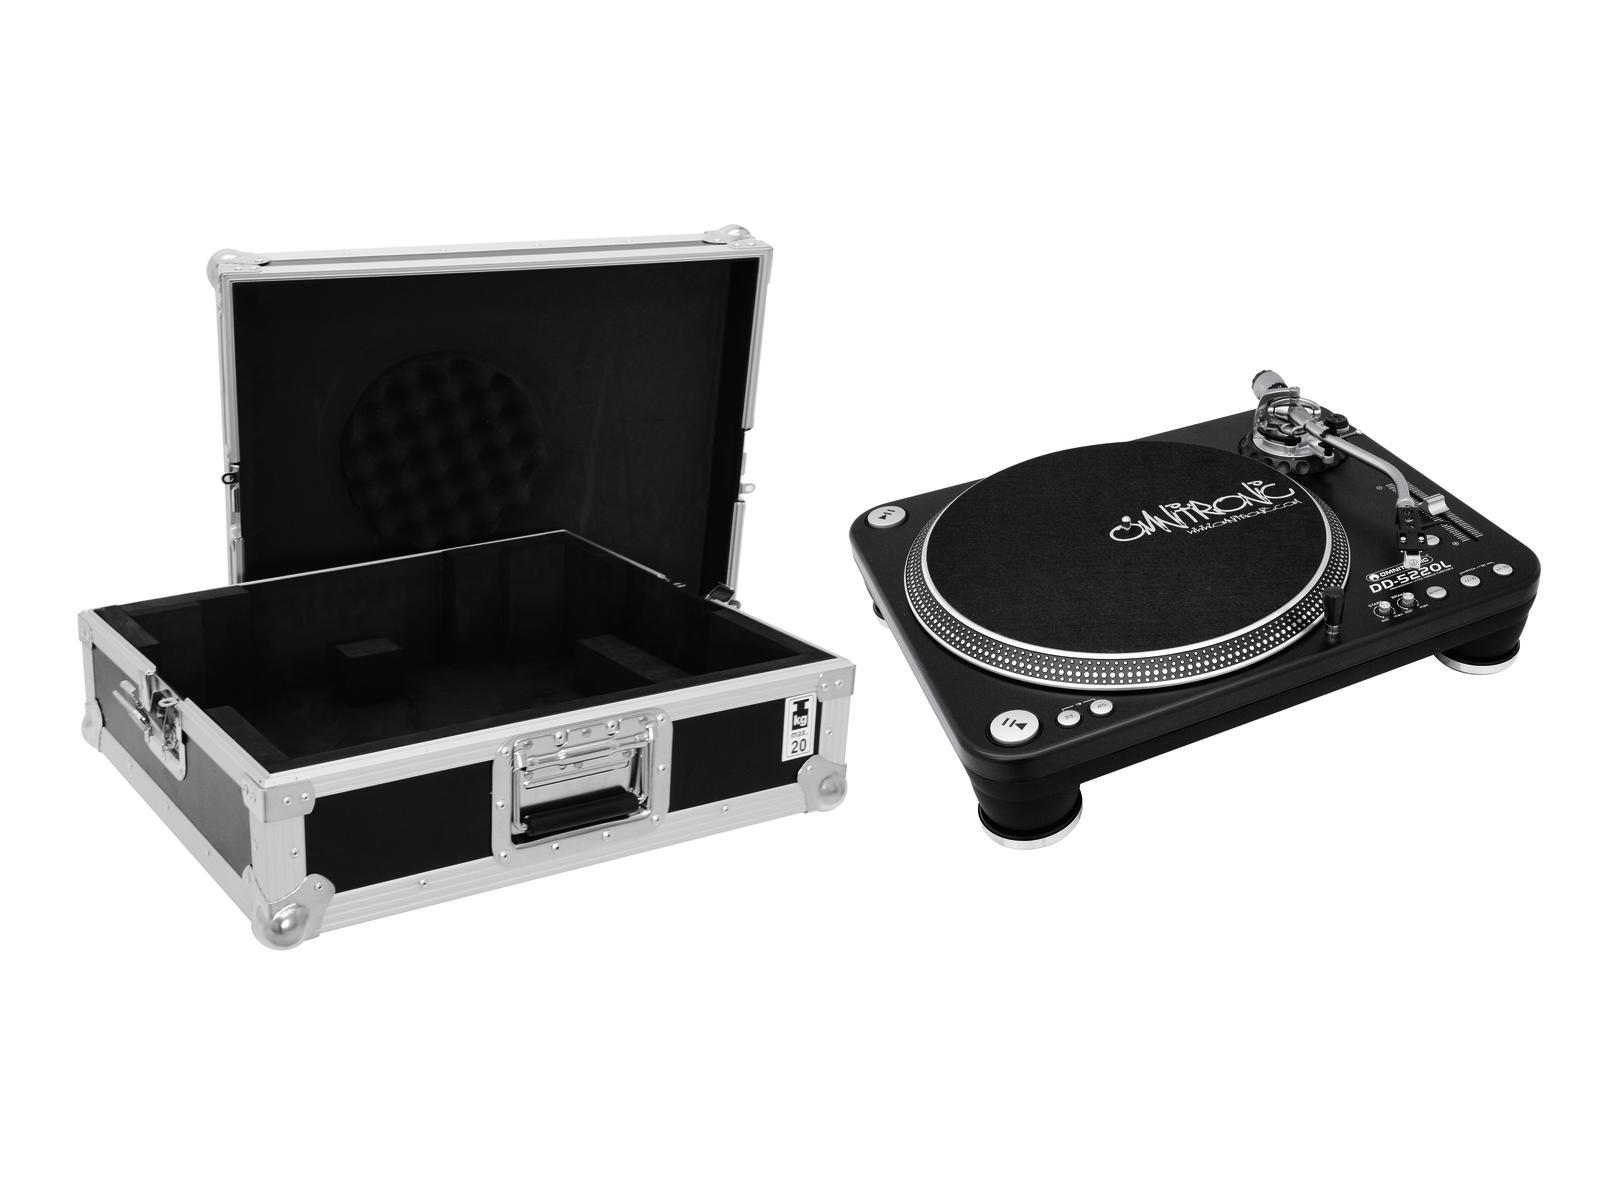 OMNITRONIC Set DD-5220L Plattenspieler sw + Case Tour Pro schwarz -B-